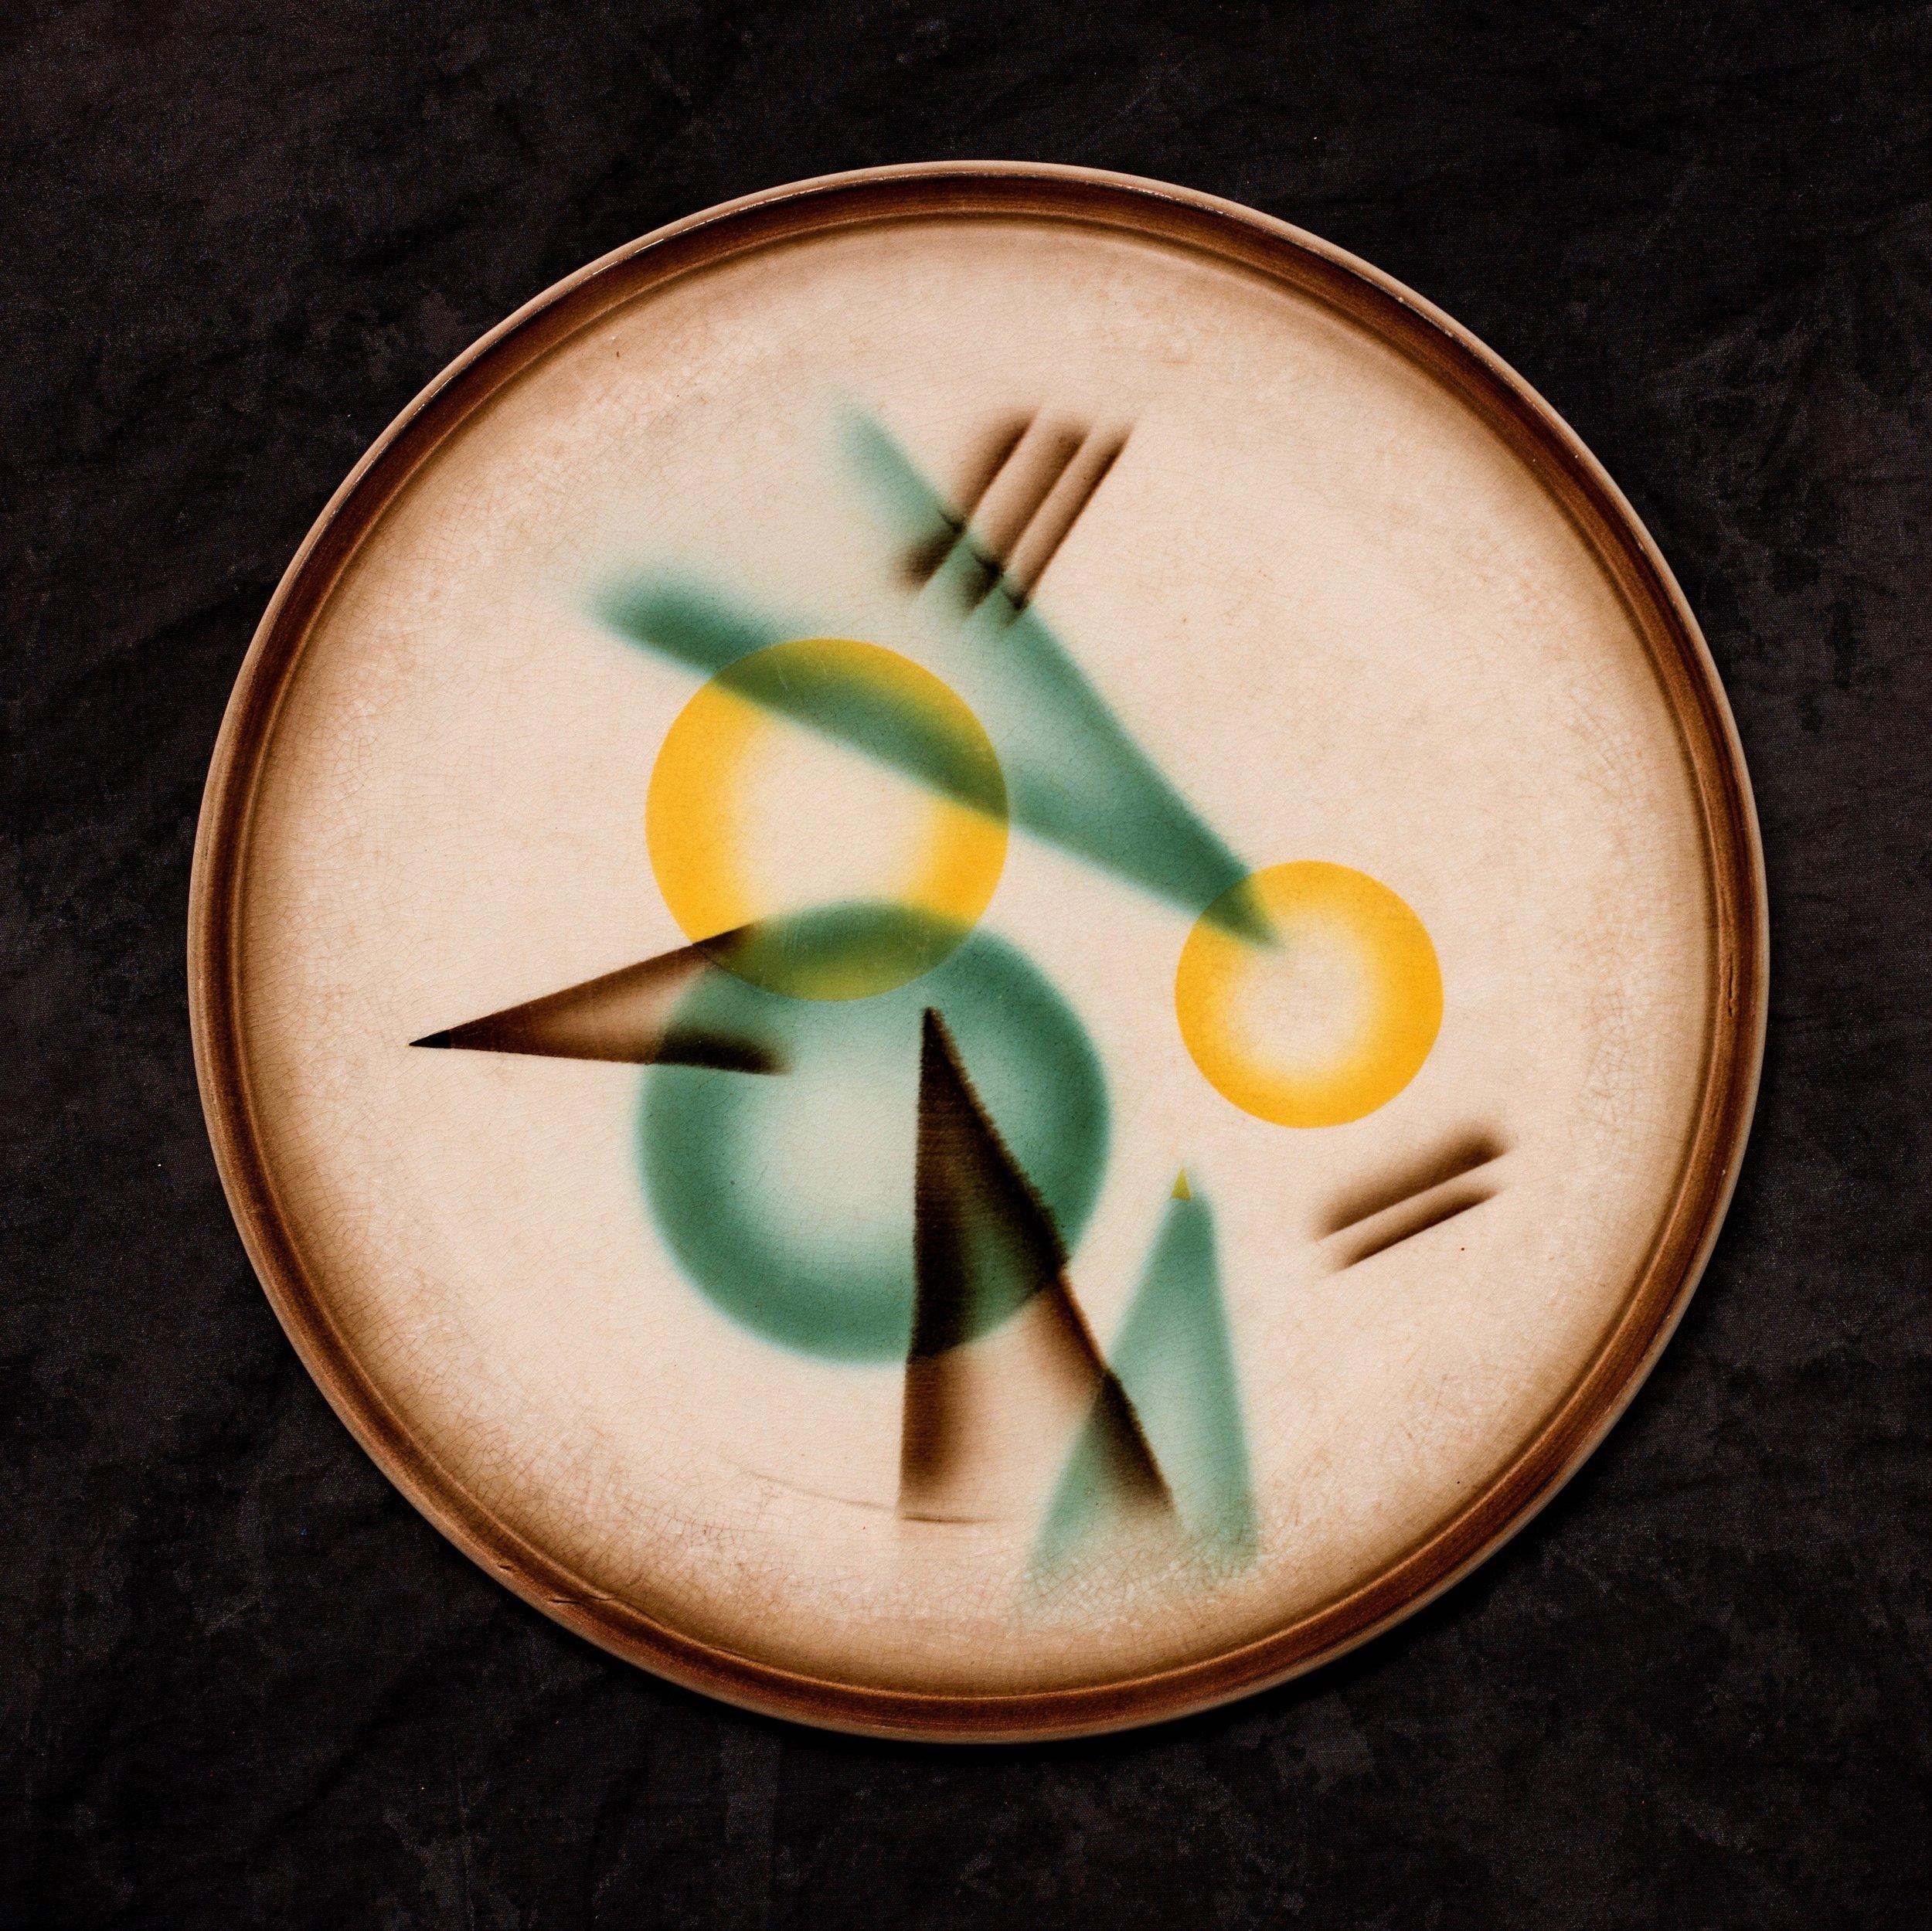 #57 Platter, form A, dec.1749, Sörnewitz, ca.1931–1932. Black SS Meissen */ 1749 / 33; 1.5 cm H, 30.5 cm top; 22 cm base Ø. RM743